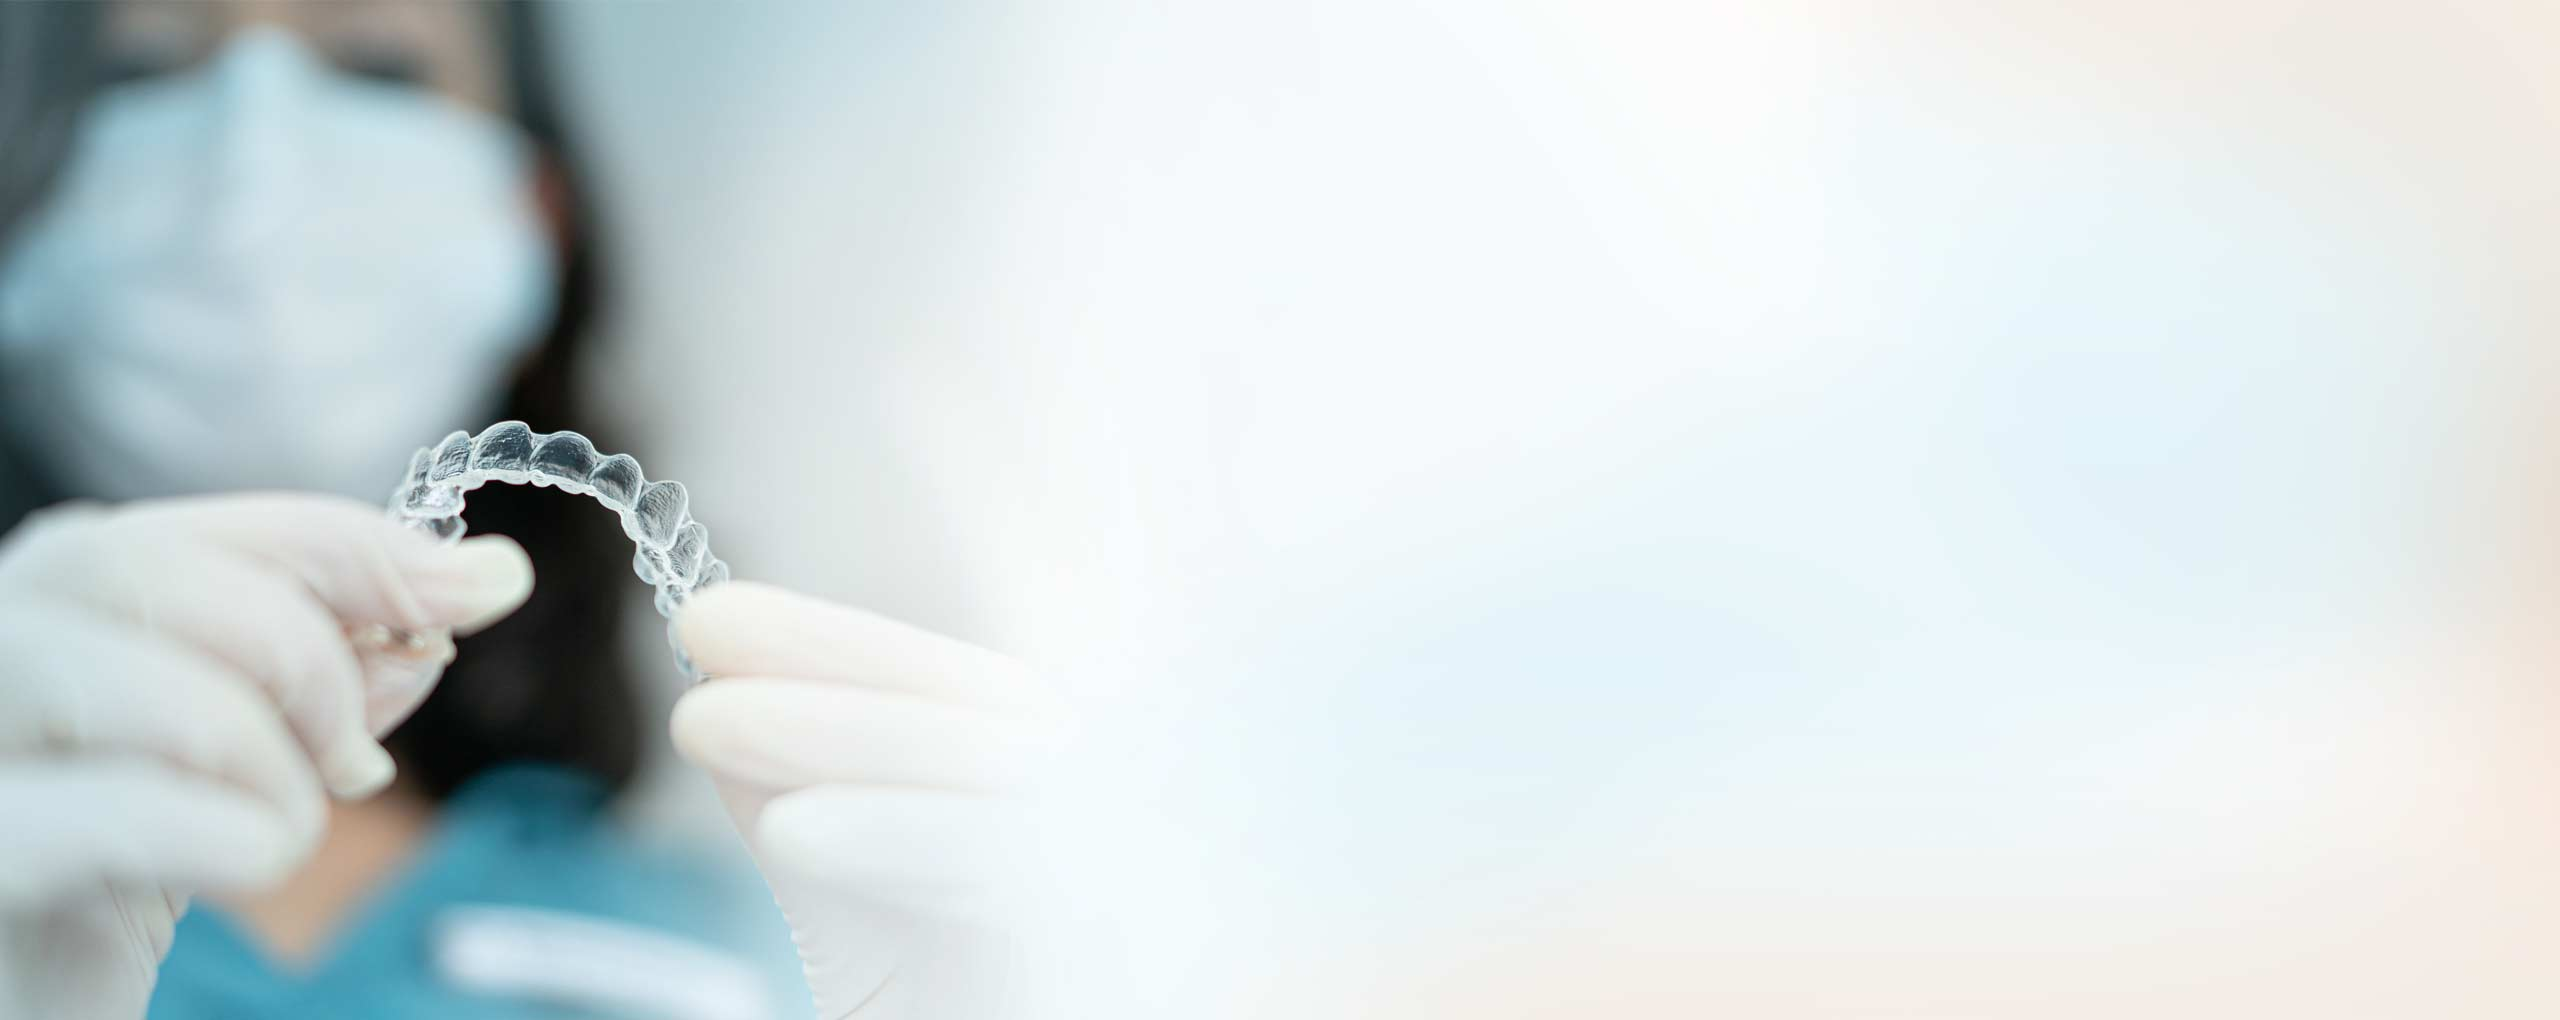 weickum zahnarzt mannheim behandlungsspektrum invisalign